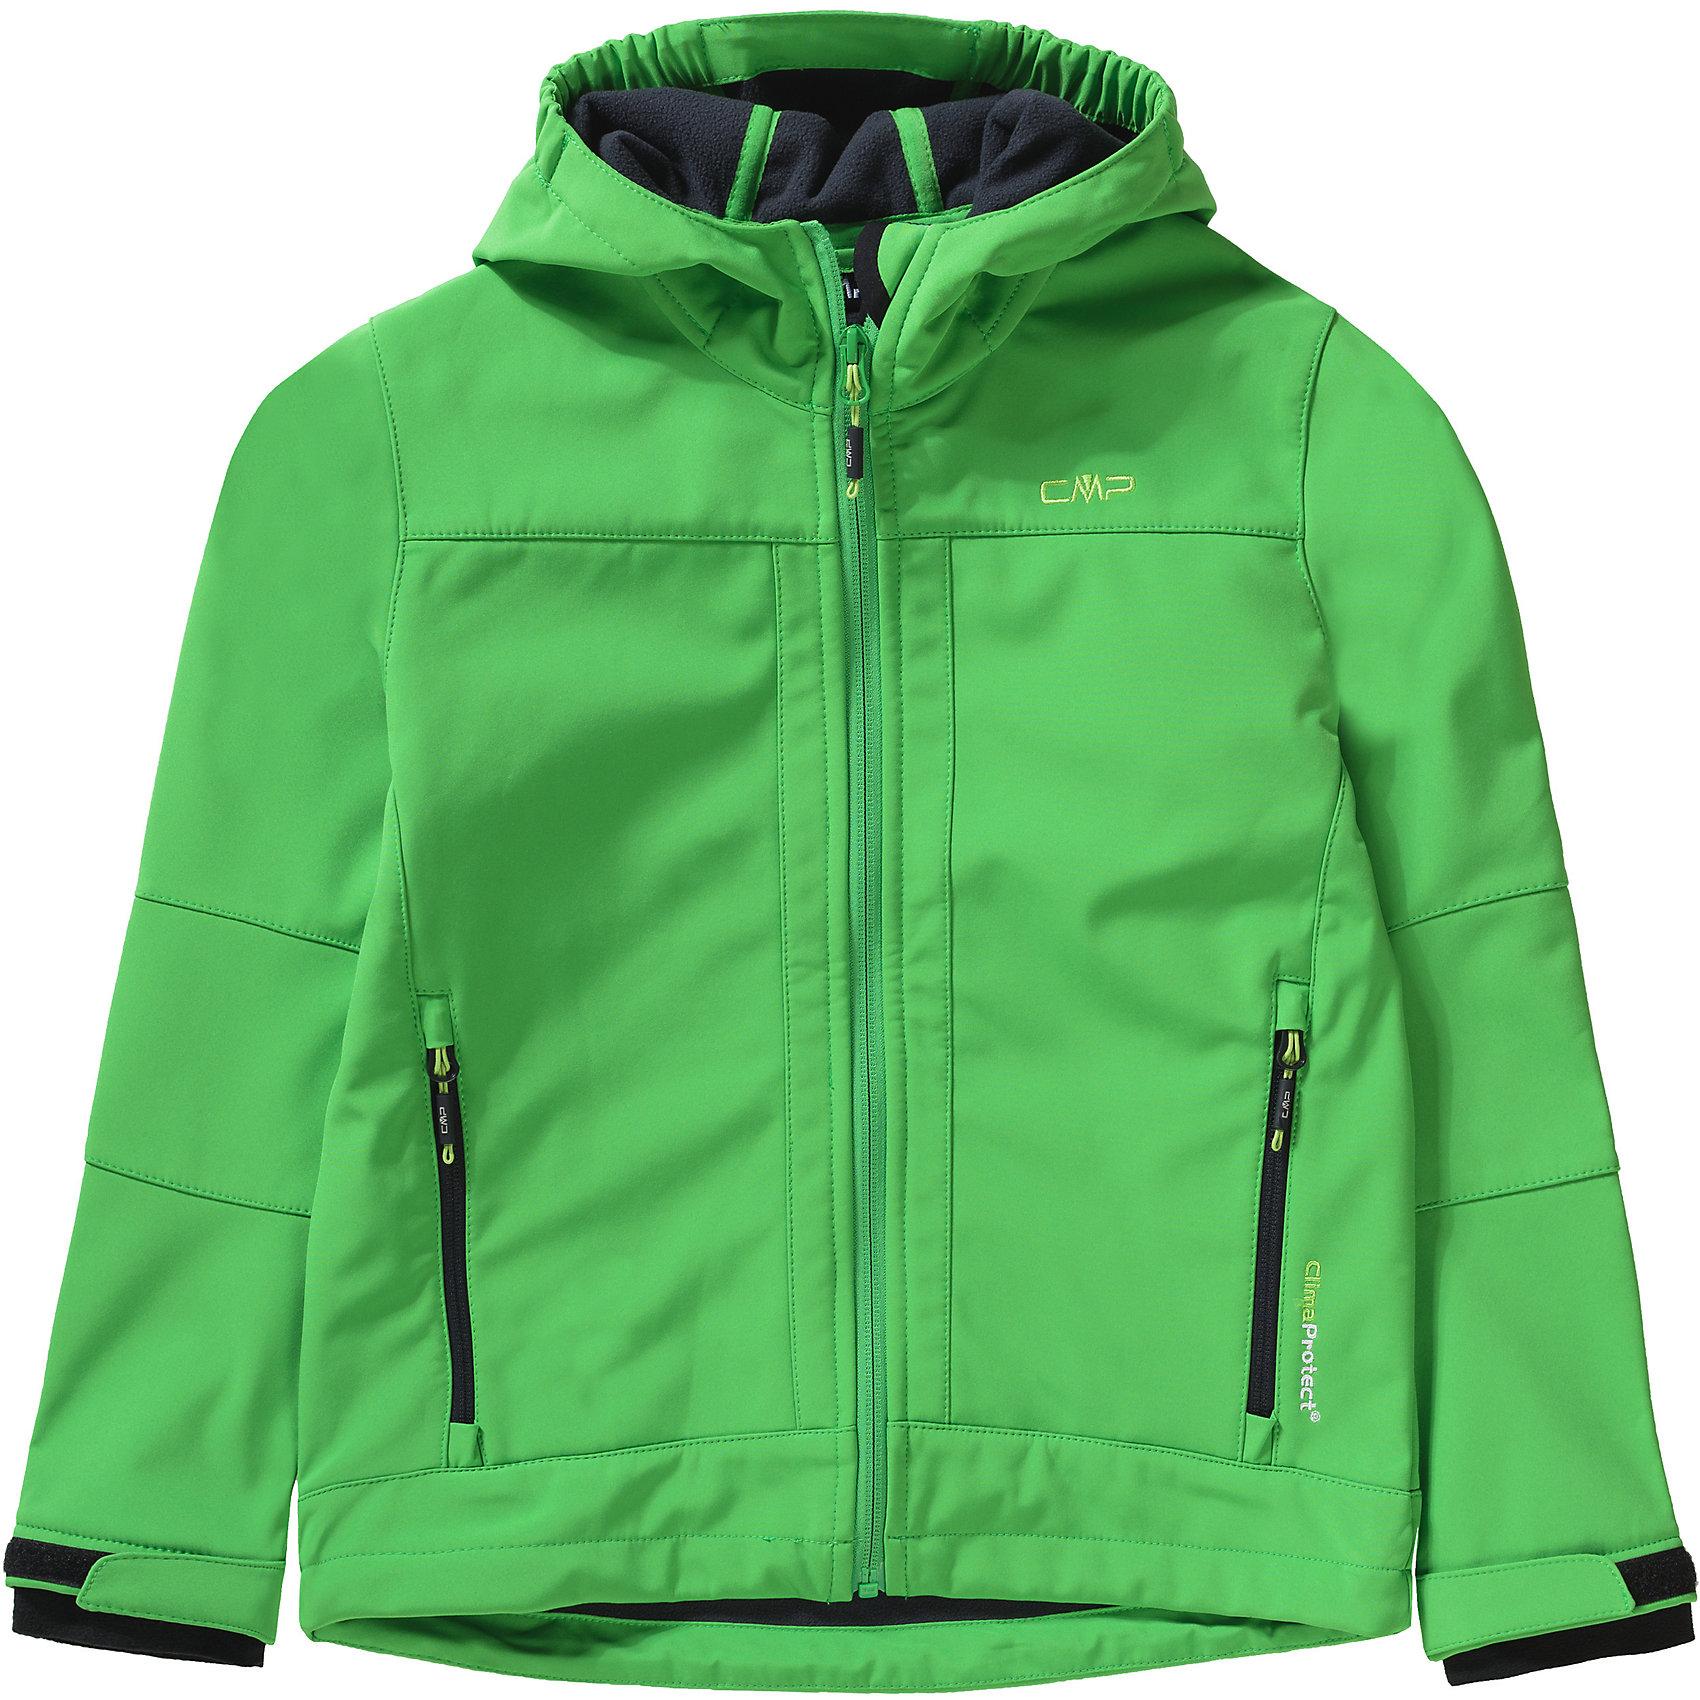 25b094ea0e8e1 Neu CMP Softshelljacke für Jungen 7572111 für Jungen grün petrol